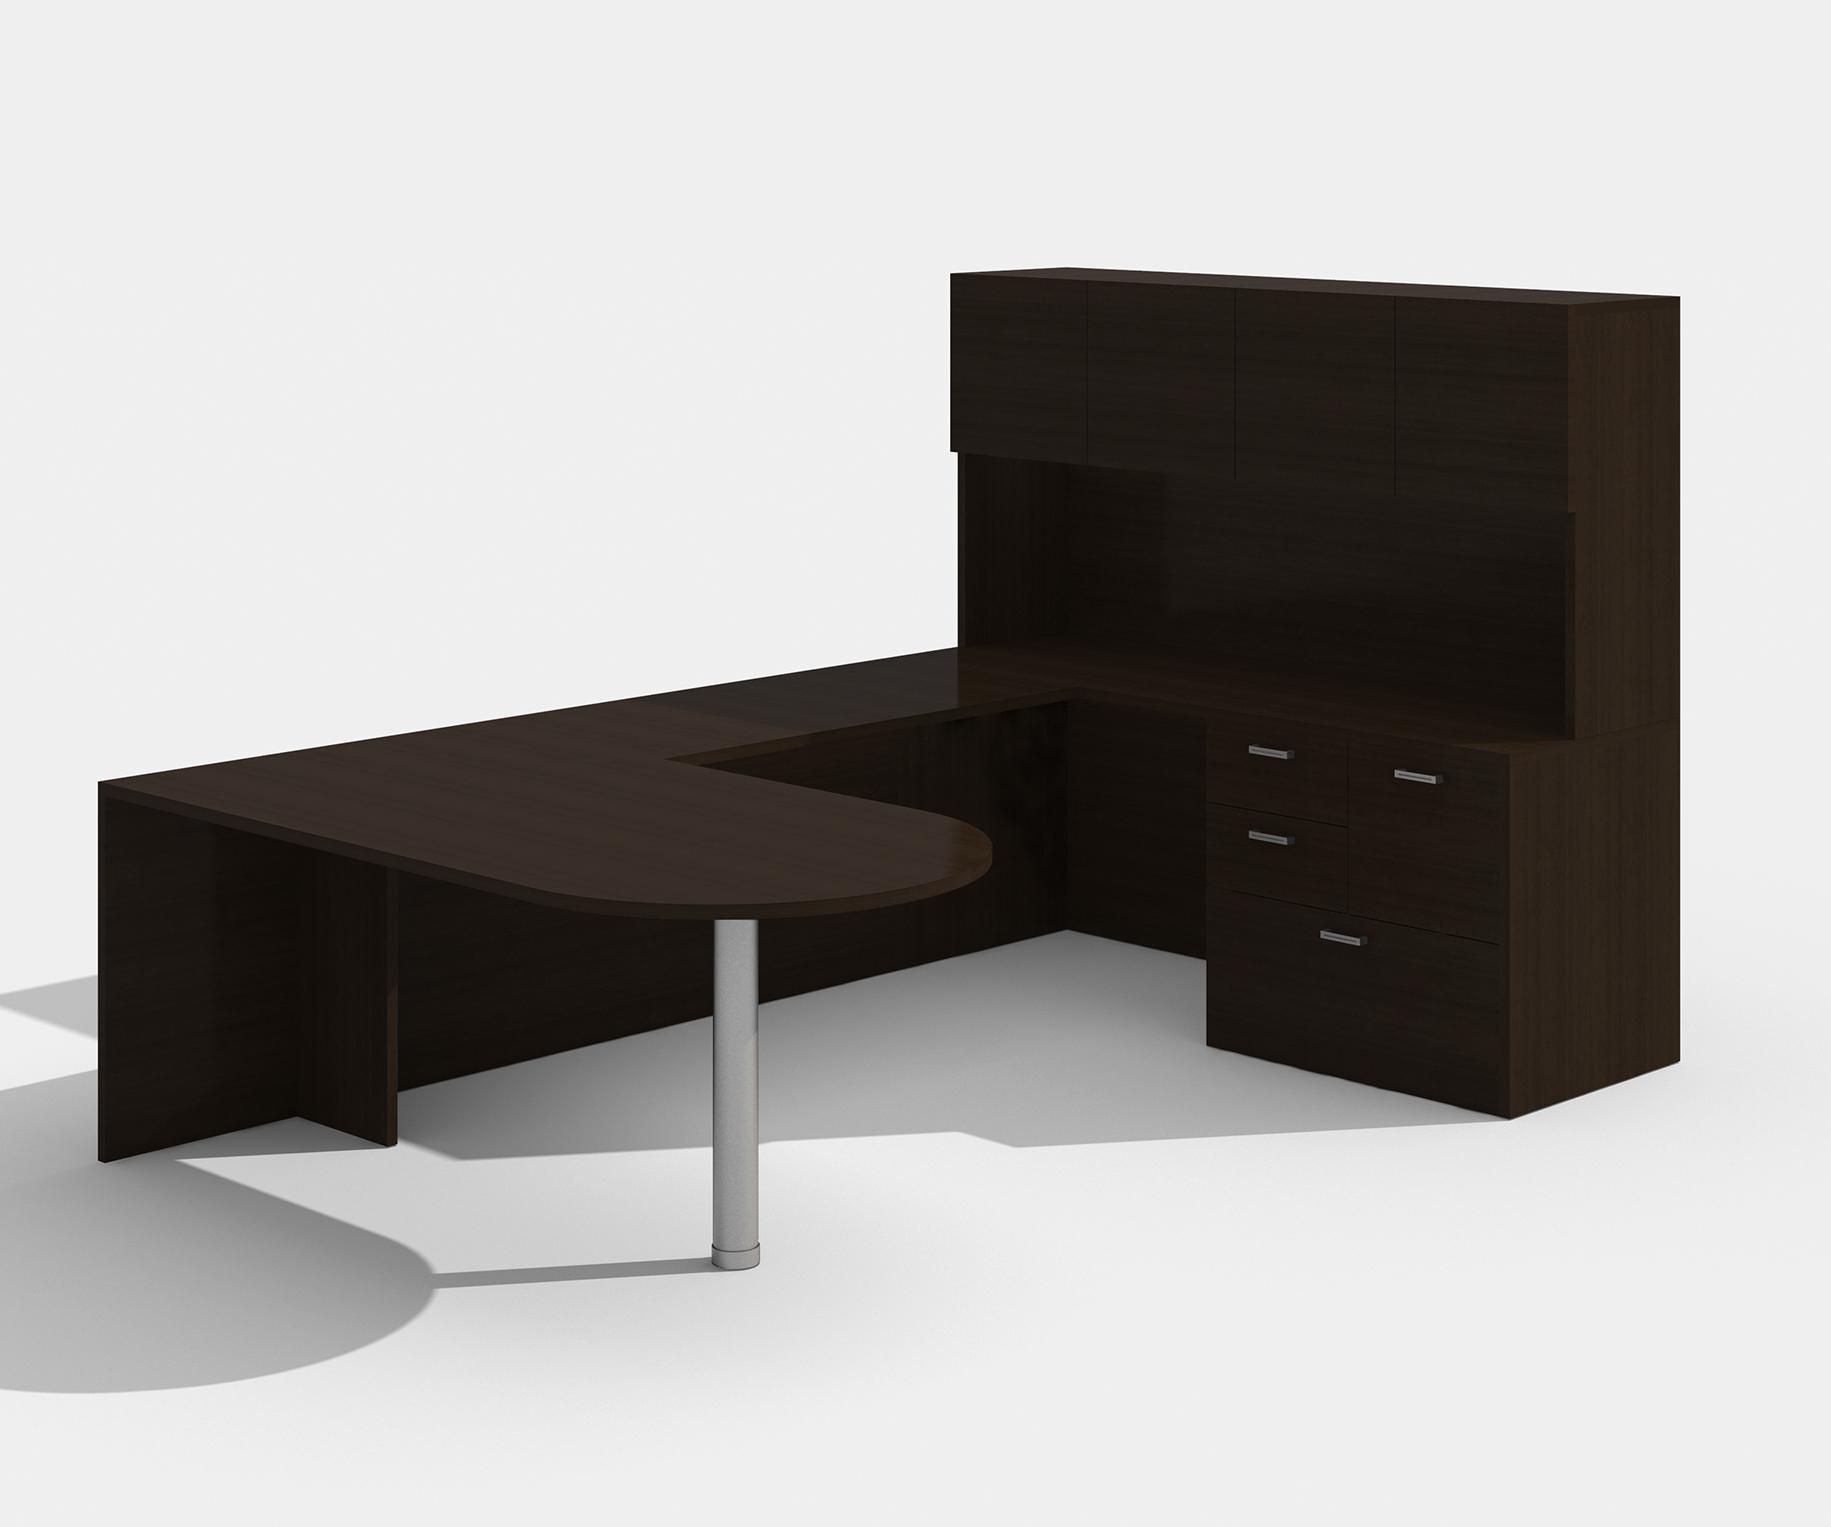 black cherry am-363n amber bullet shape u desk with hutch